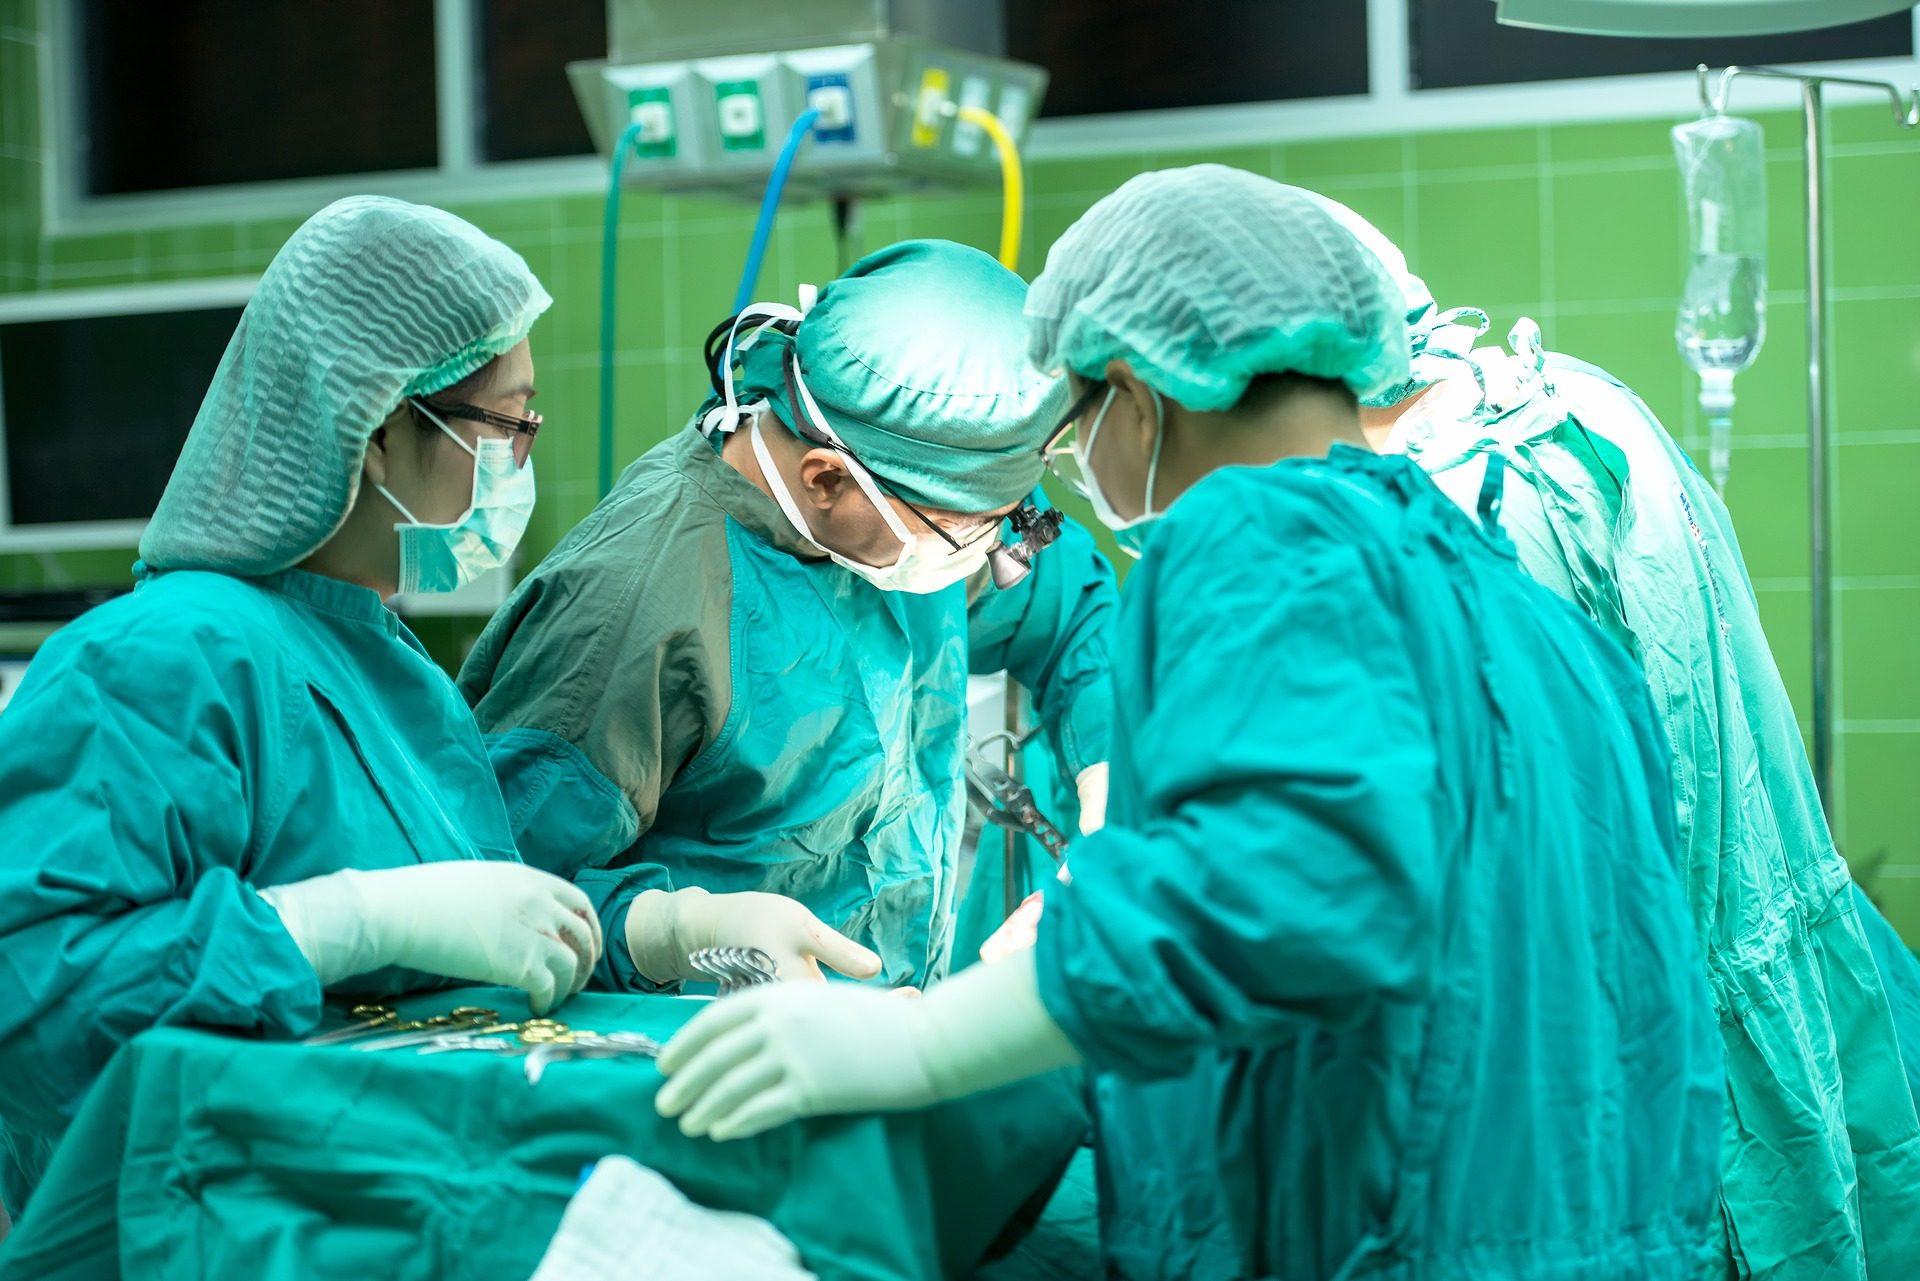 Help or Harm? Rethinking Common Surgeries